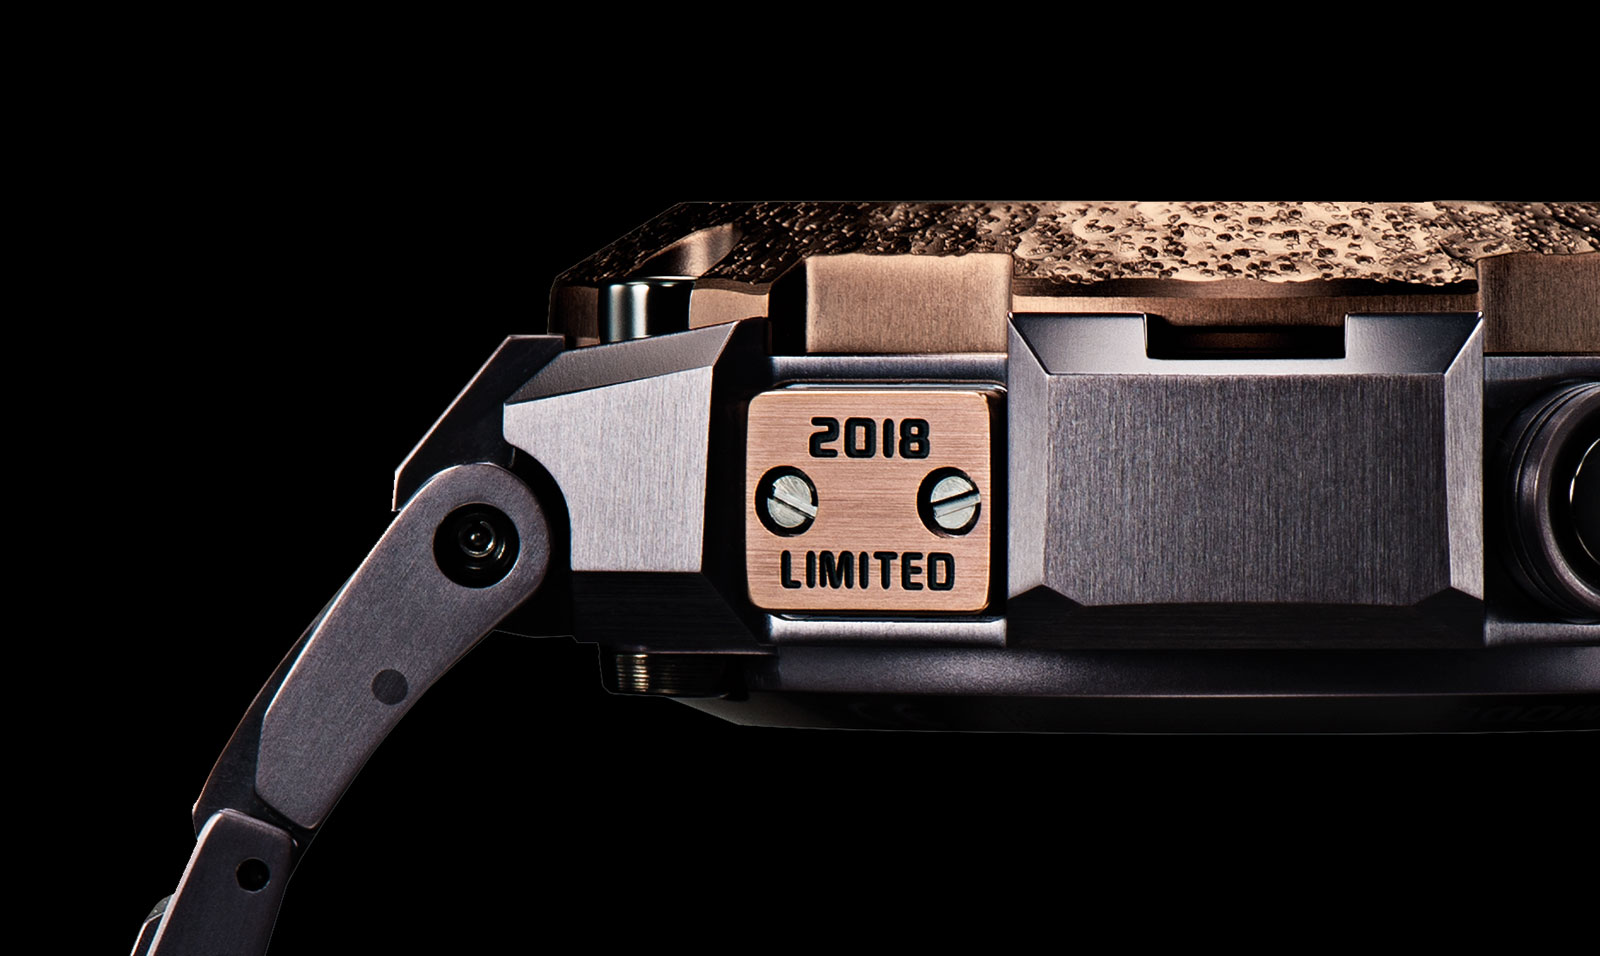 G Shock MR-G Hammer Tone MRG-G2000HA 5